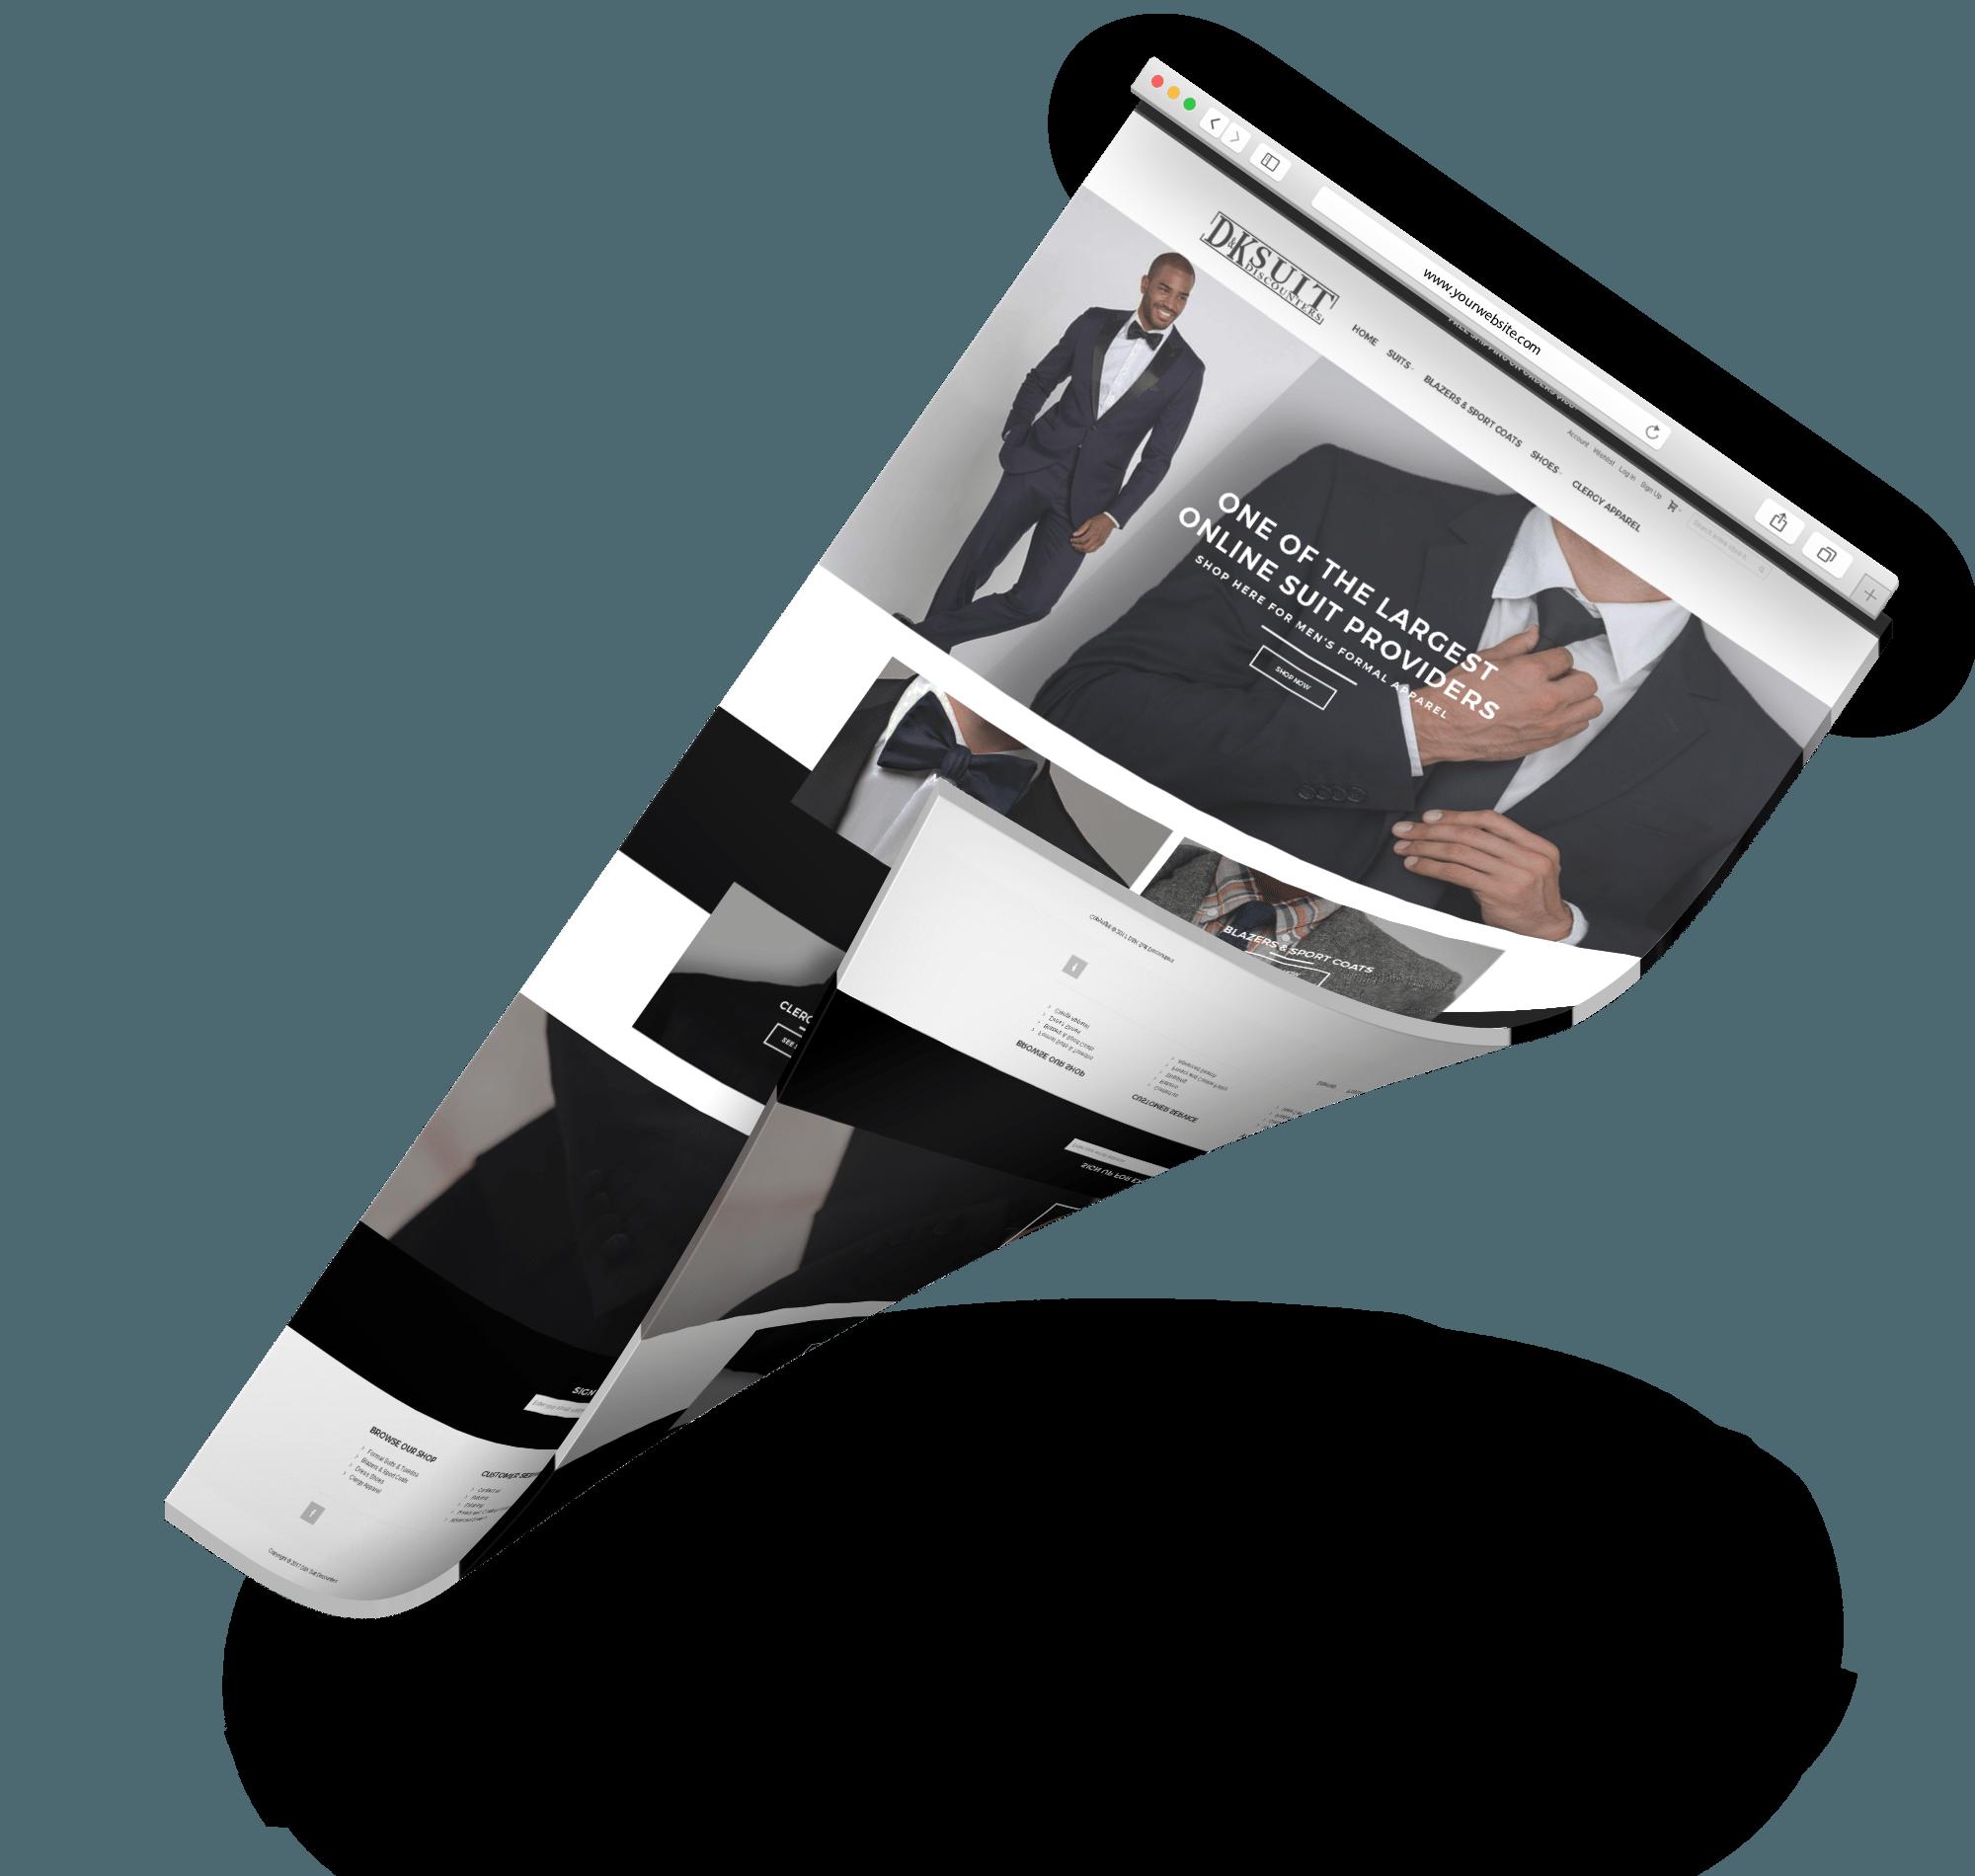 dnk suits web design sem seo specialist